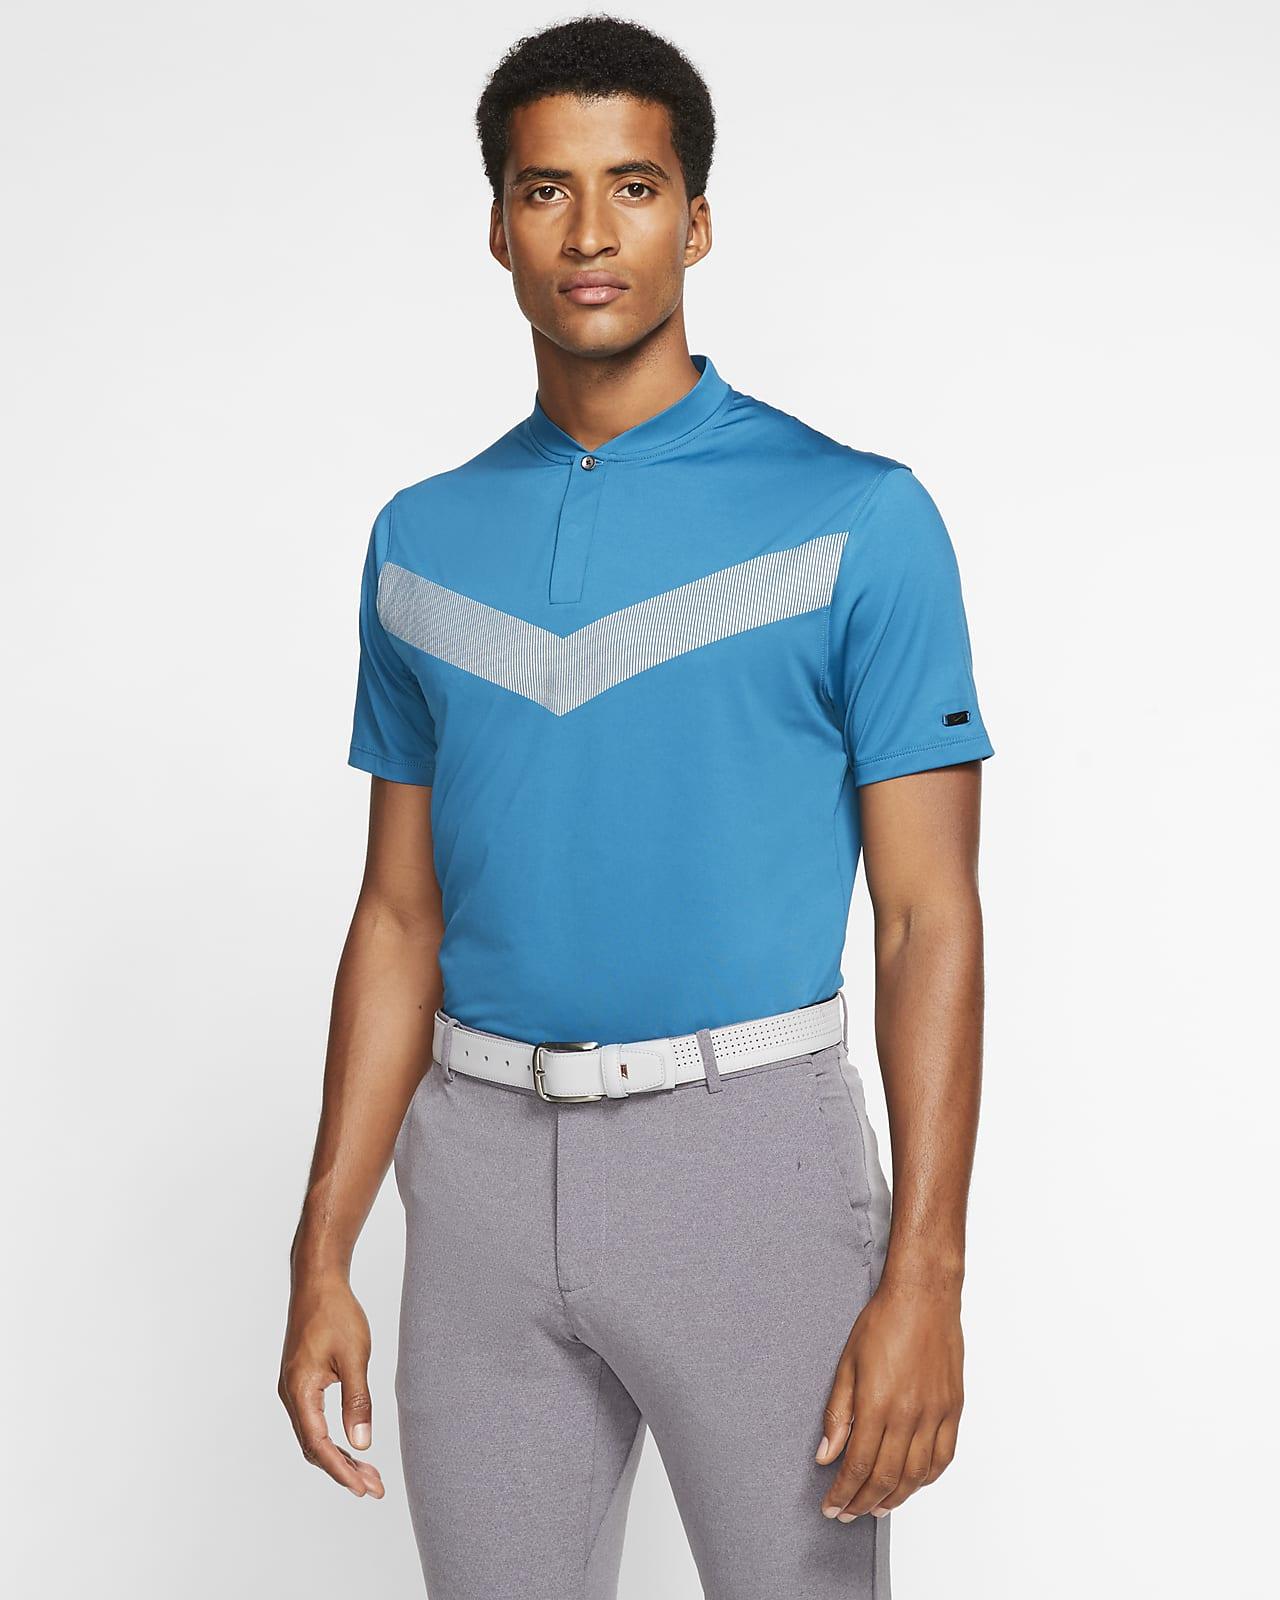 Polo de golf para hombre Nike Dri-FIT Tiger Woods Vapor